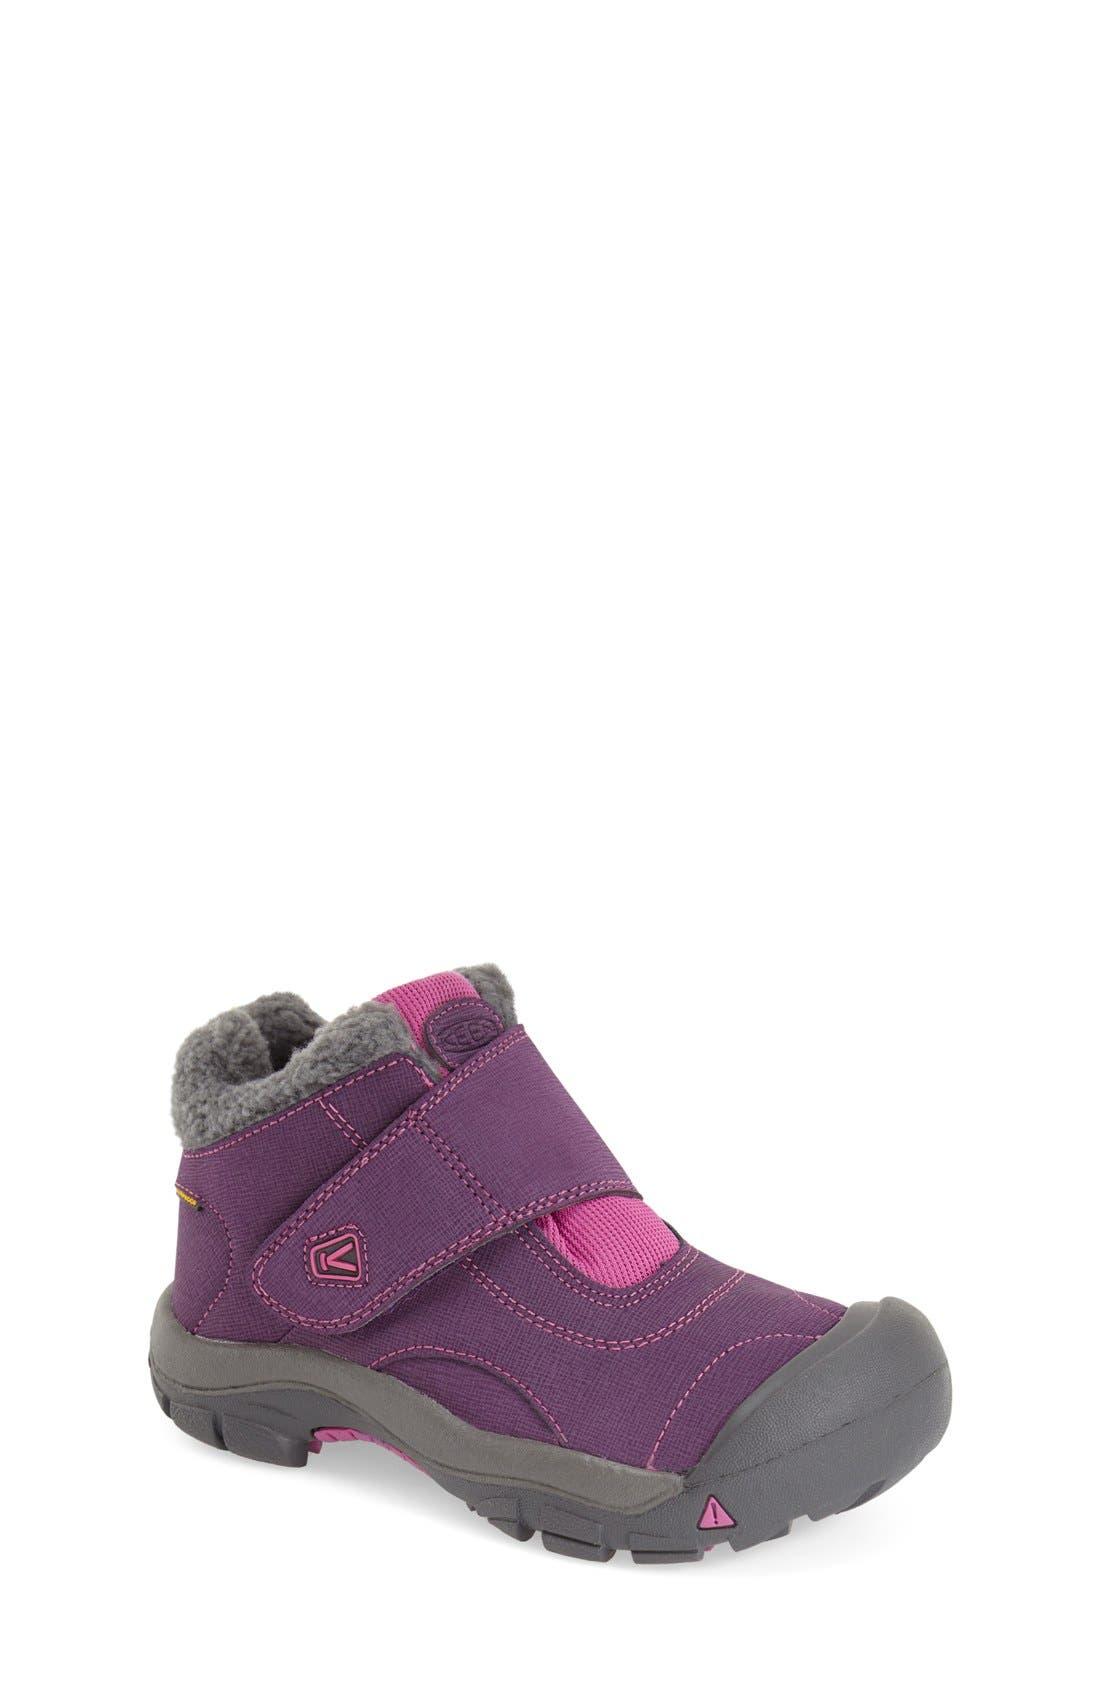 'Kootenay' Waterproof Winter Boot,                         Main,                         color, Wineberry/ Dahlia Mauve